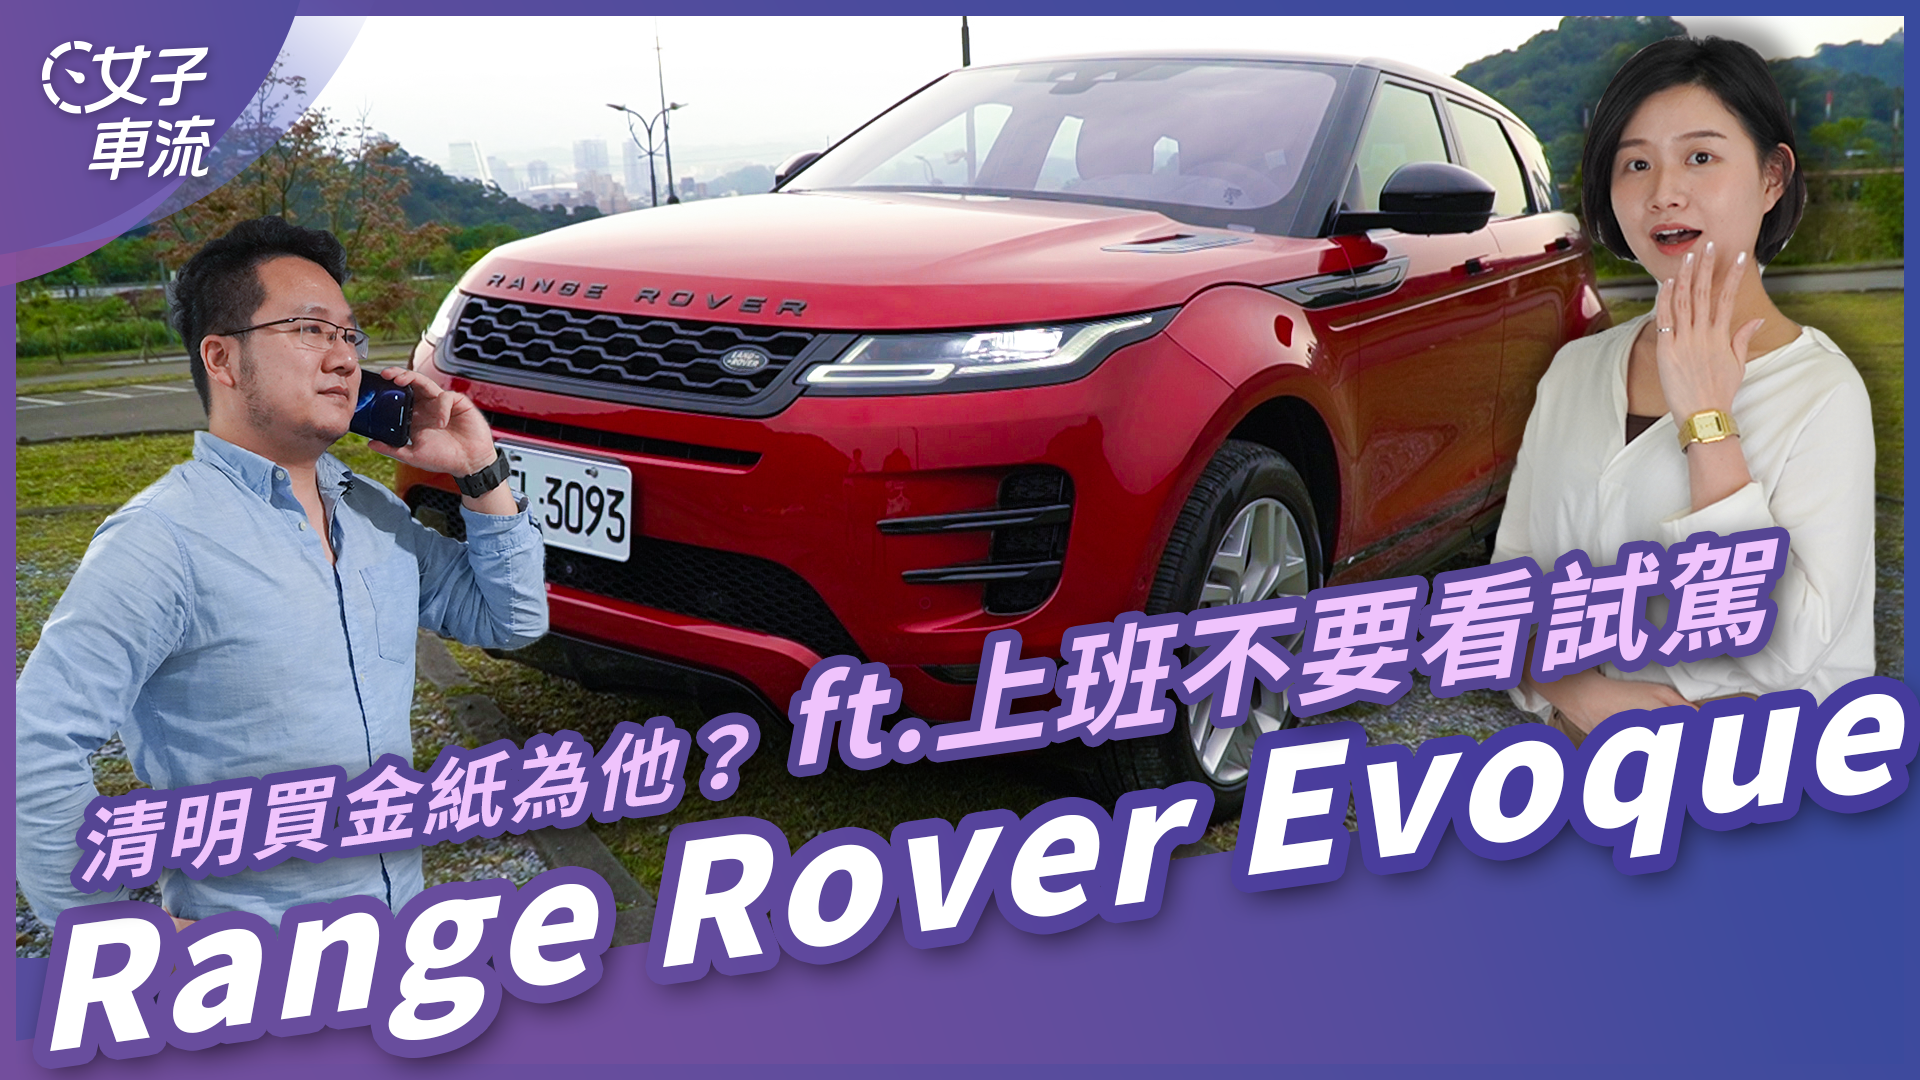 Range Rover Evoque 清明節採買 ft. 上班不要看